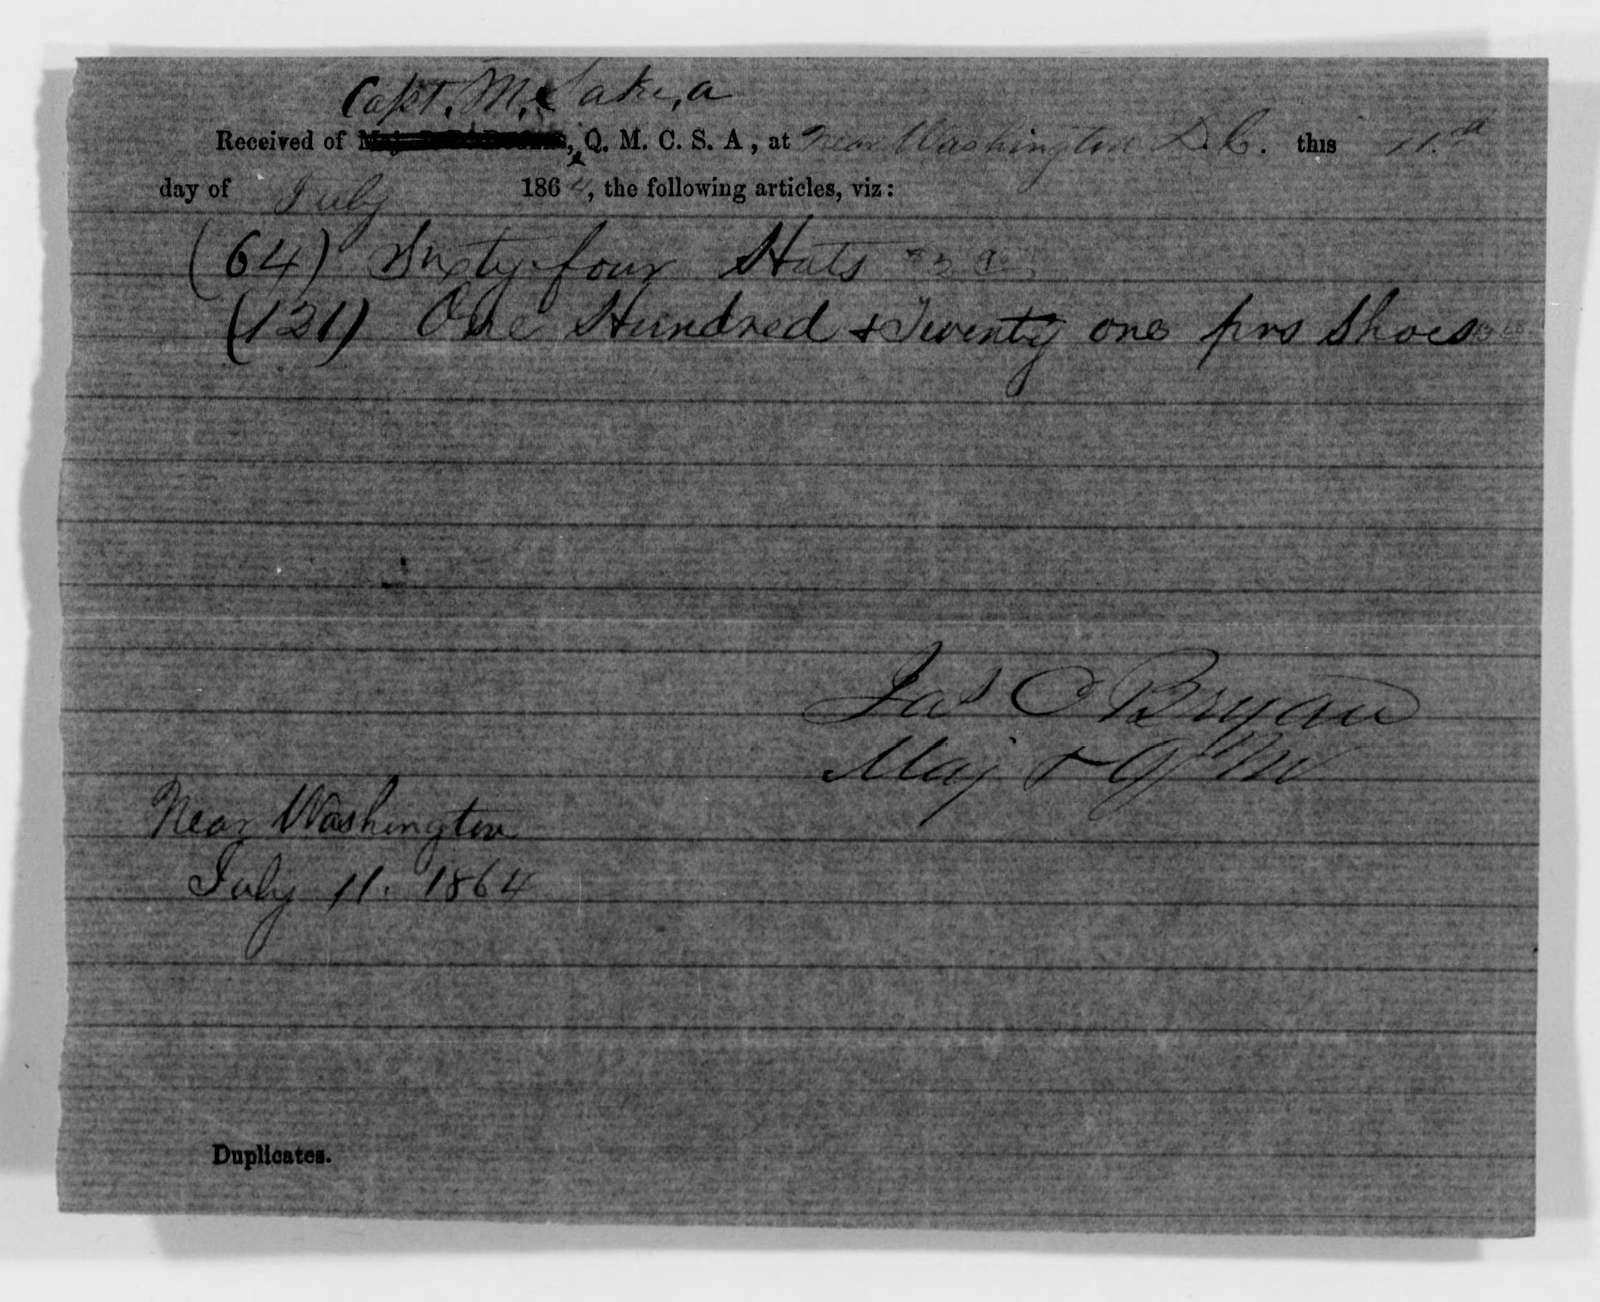 Confederate States of America records: Microfilm Reel 66